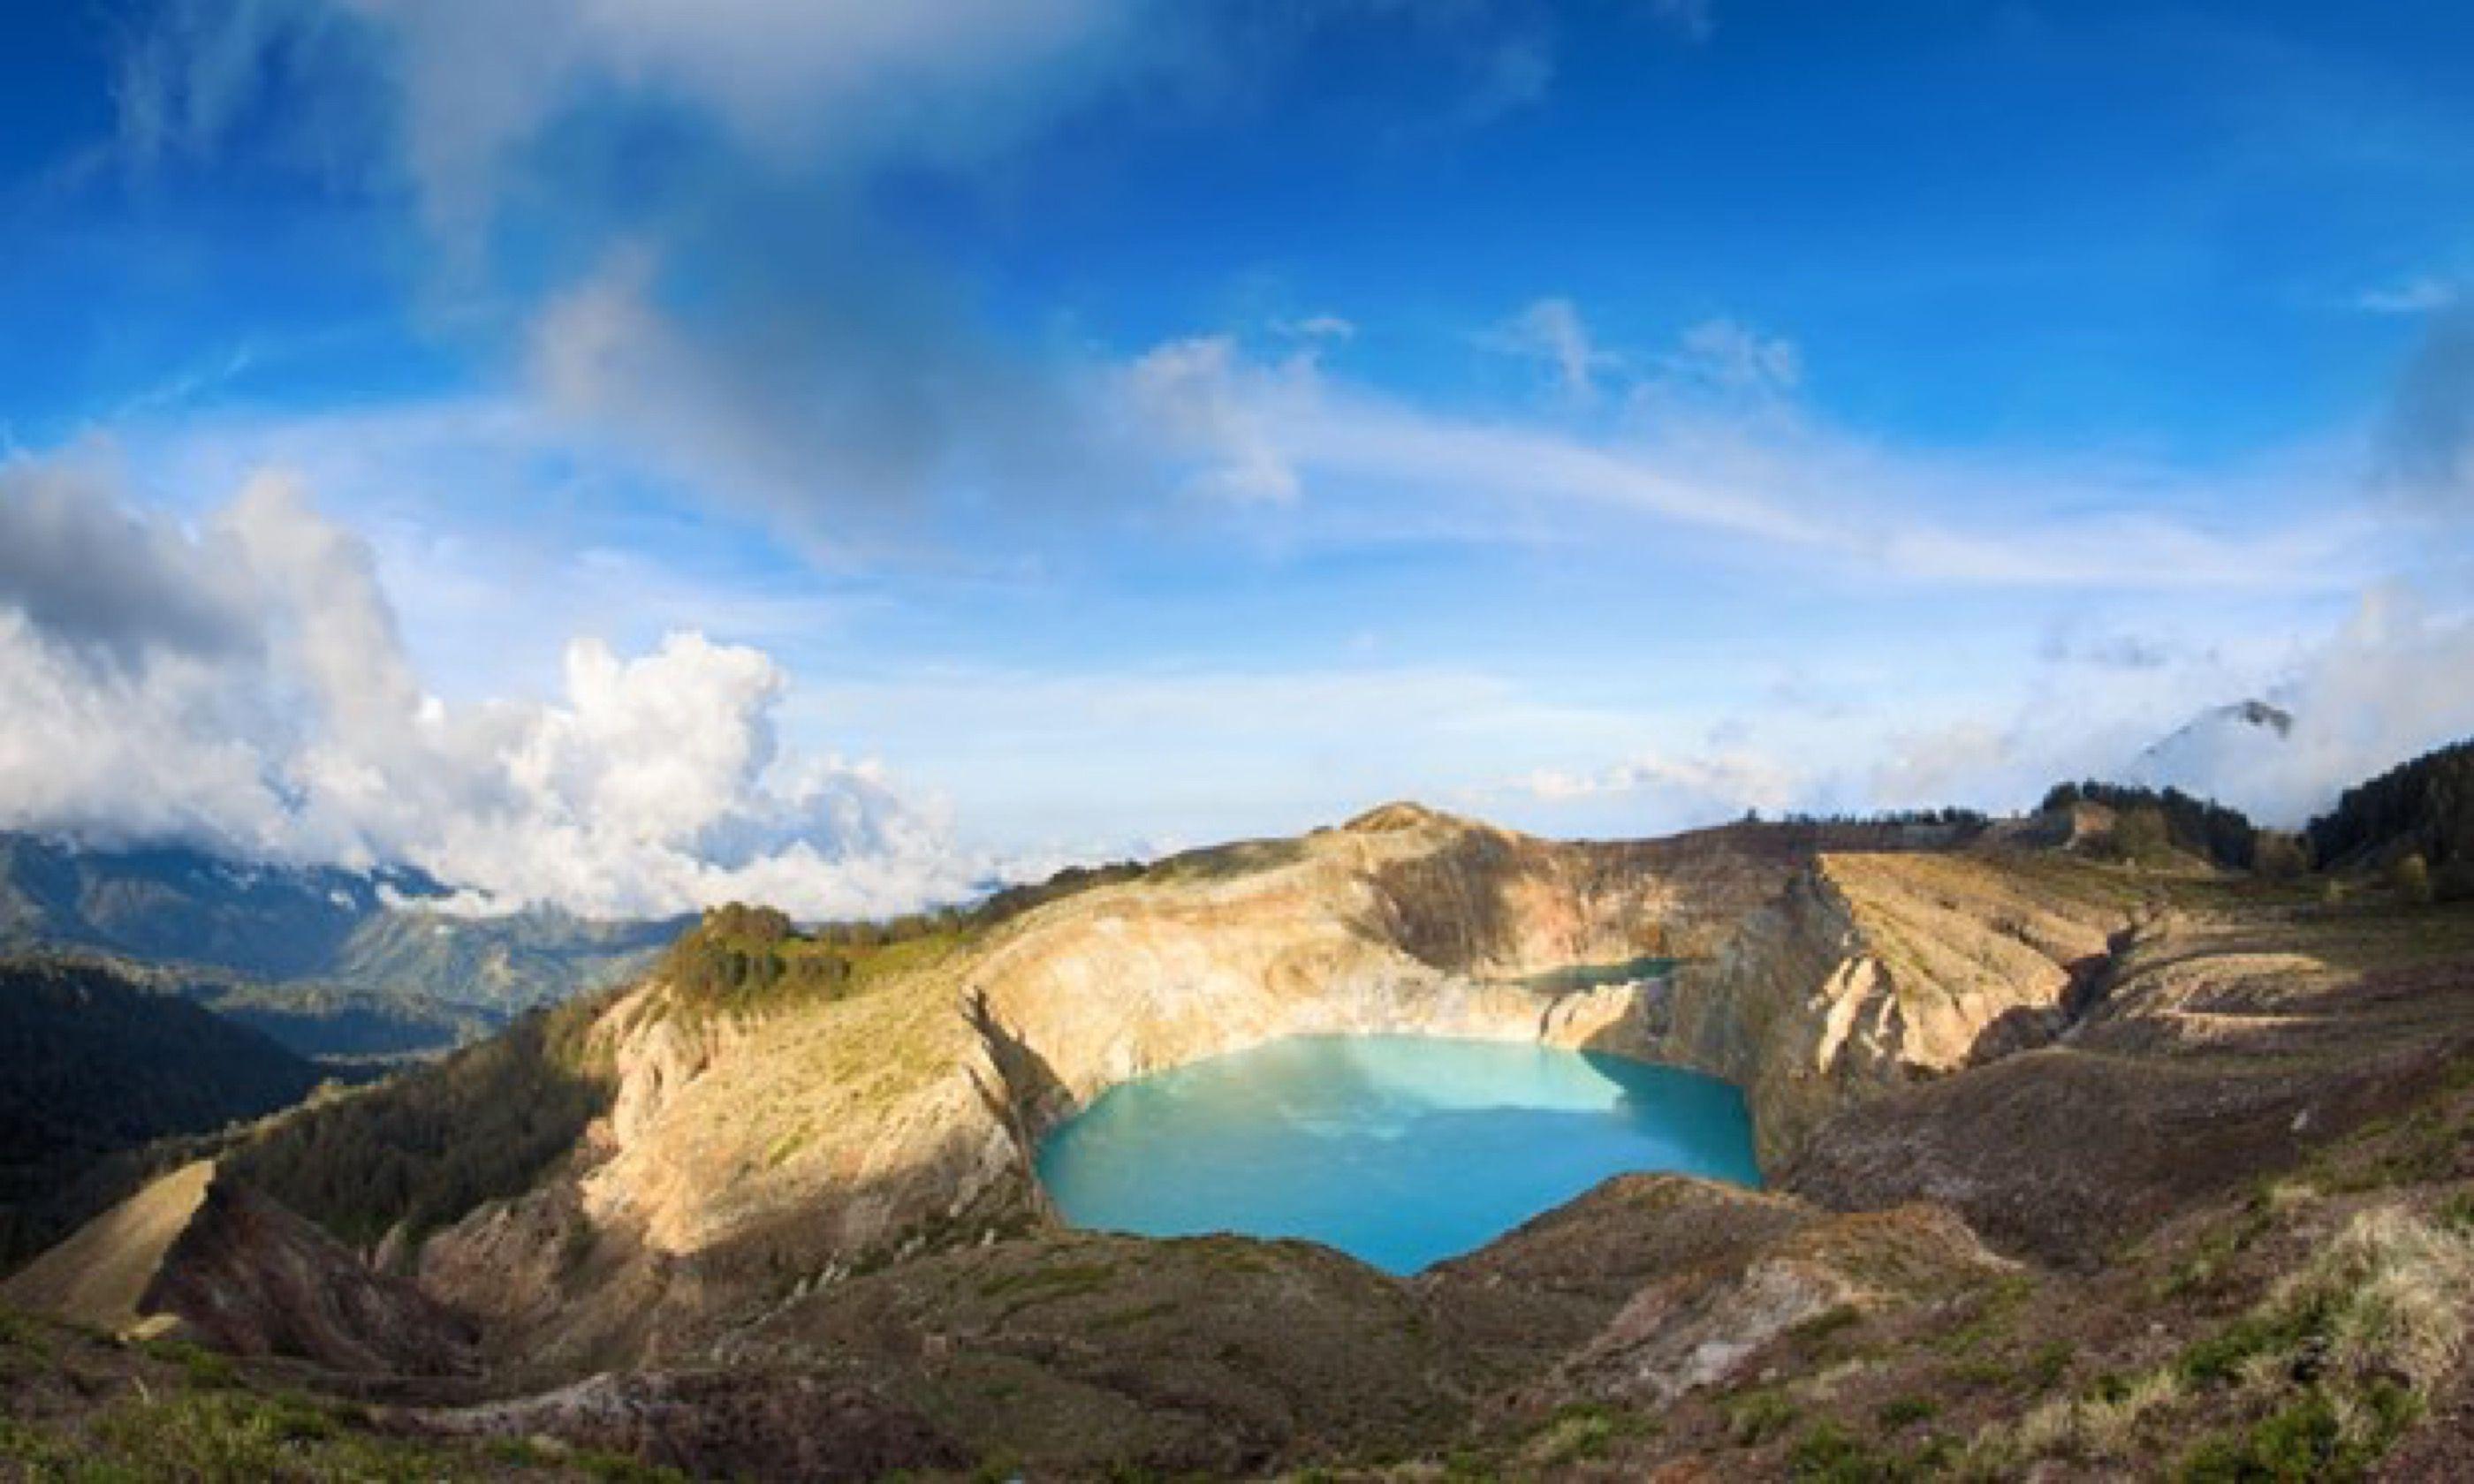 Kelimutu volcano (Shutterstock)